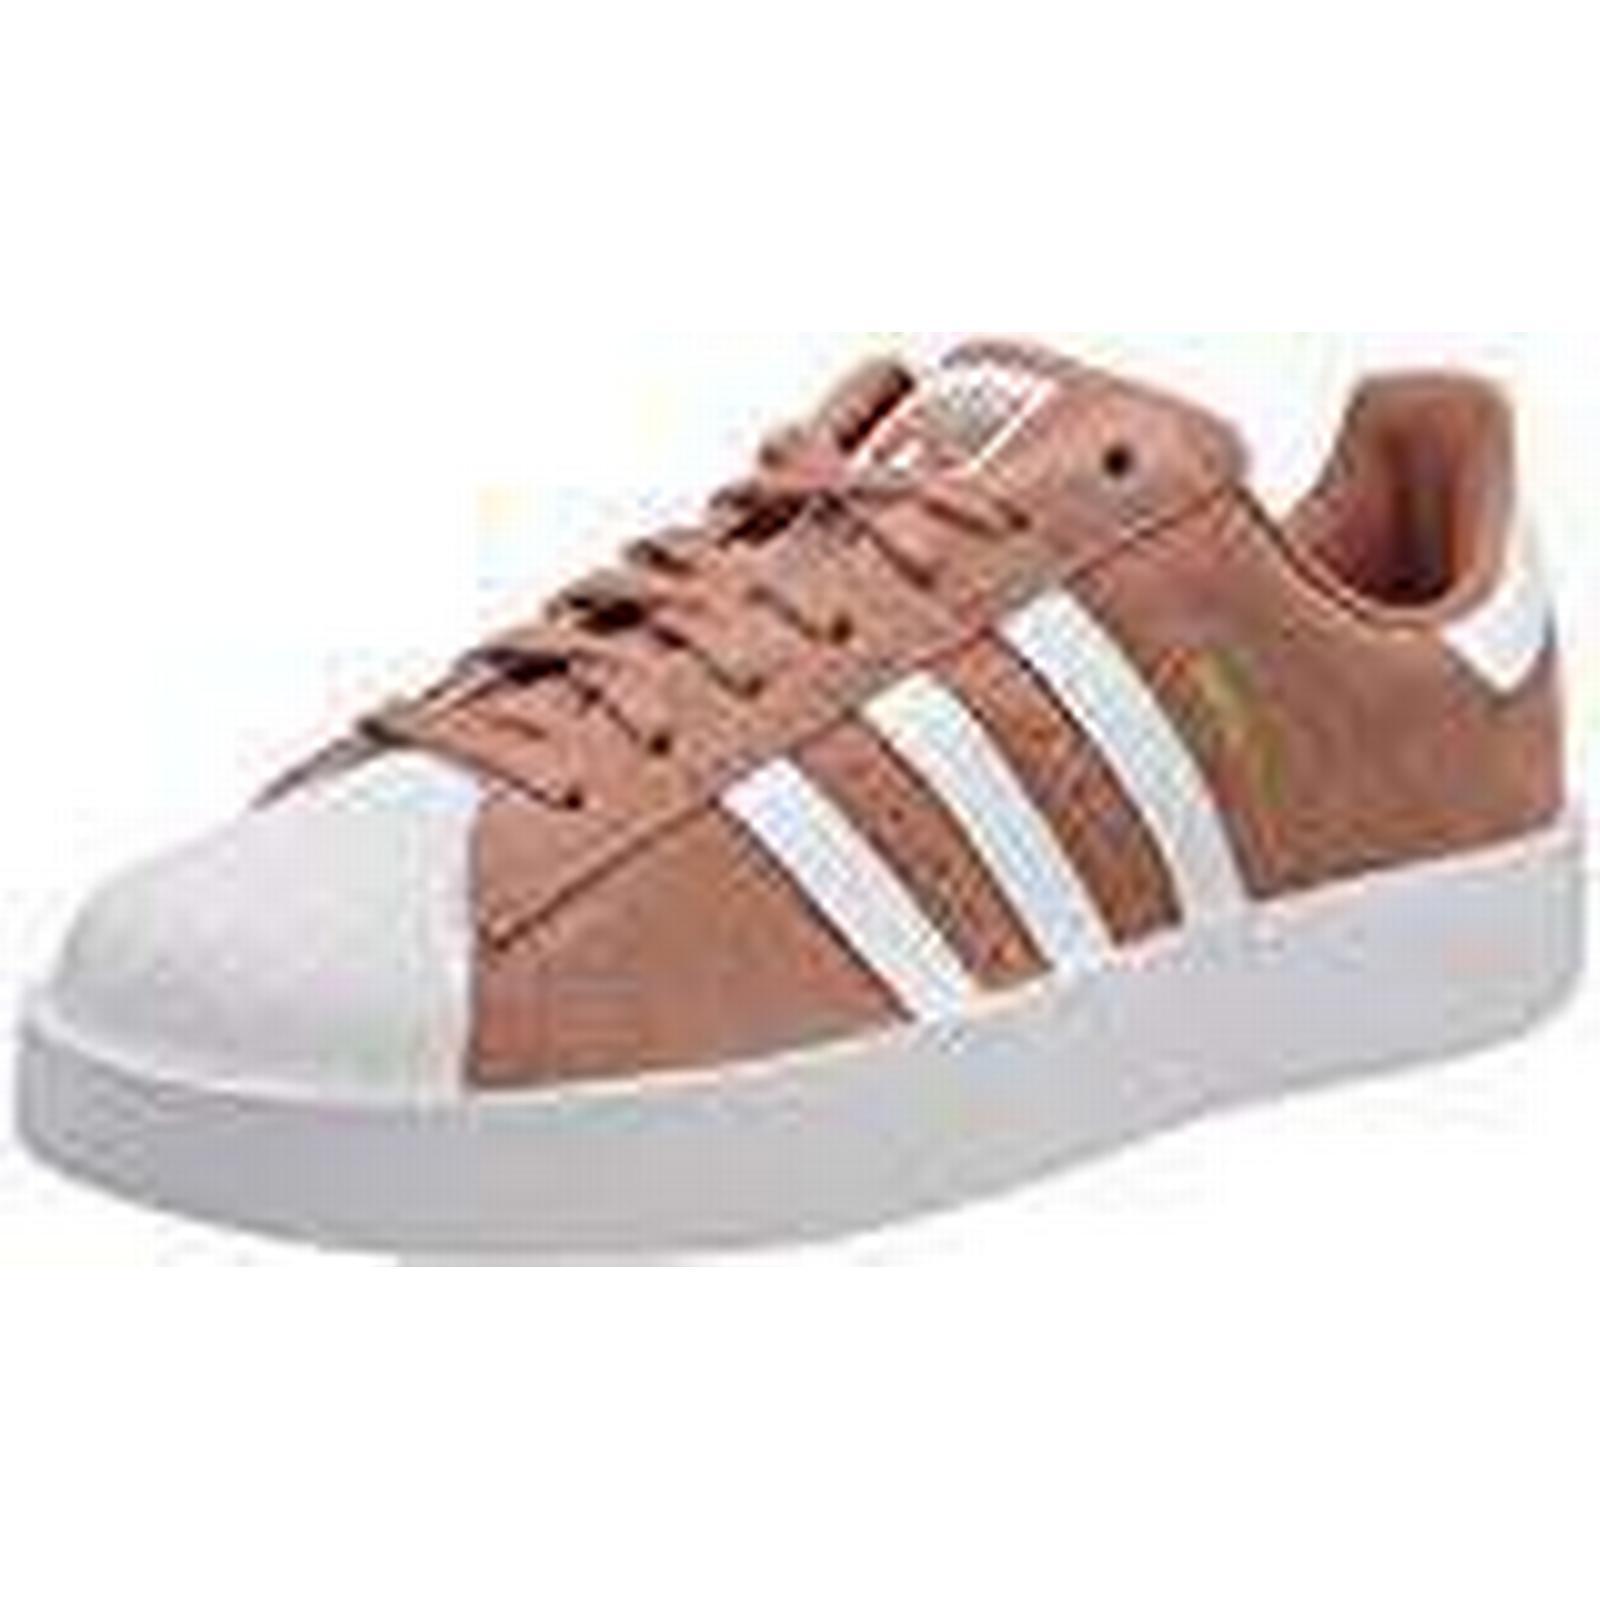 Adidas Women''s Superstar Bold Trainers, (Ash Pink/Footwear White/Gold Metallic 0), EU 7.5 UK 41 1/3 EU 0), d17103